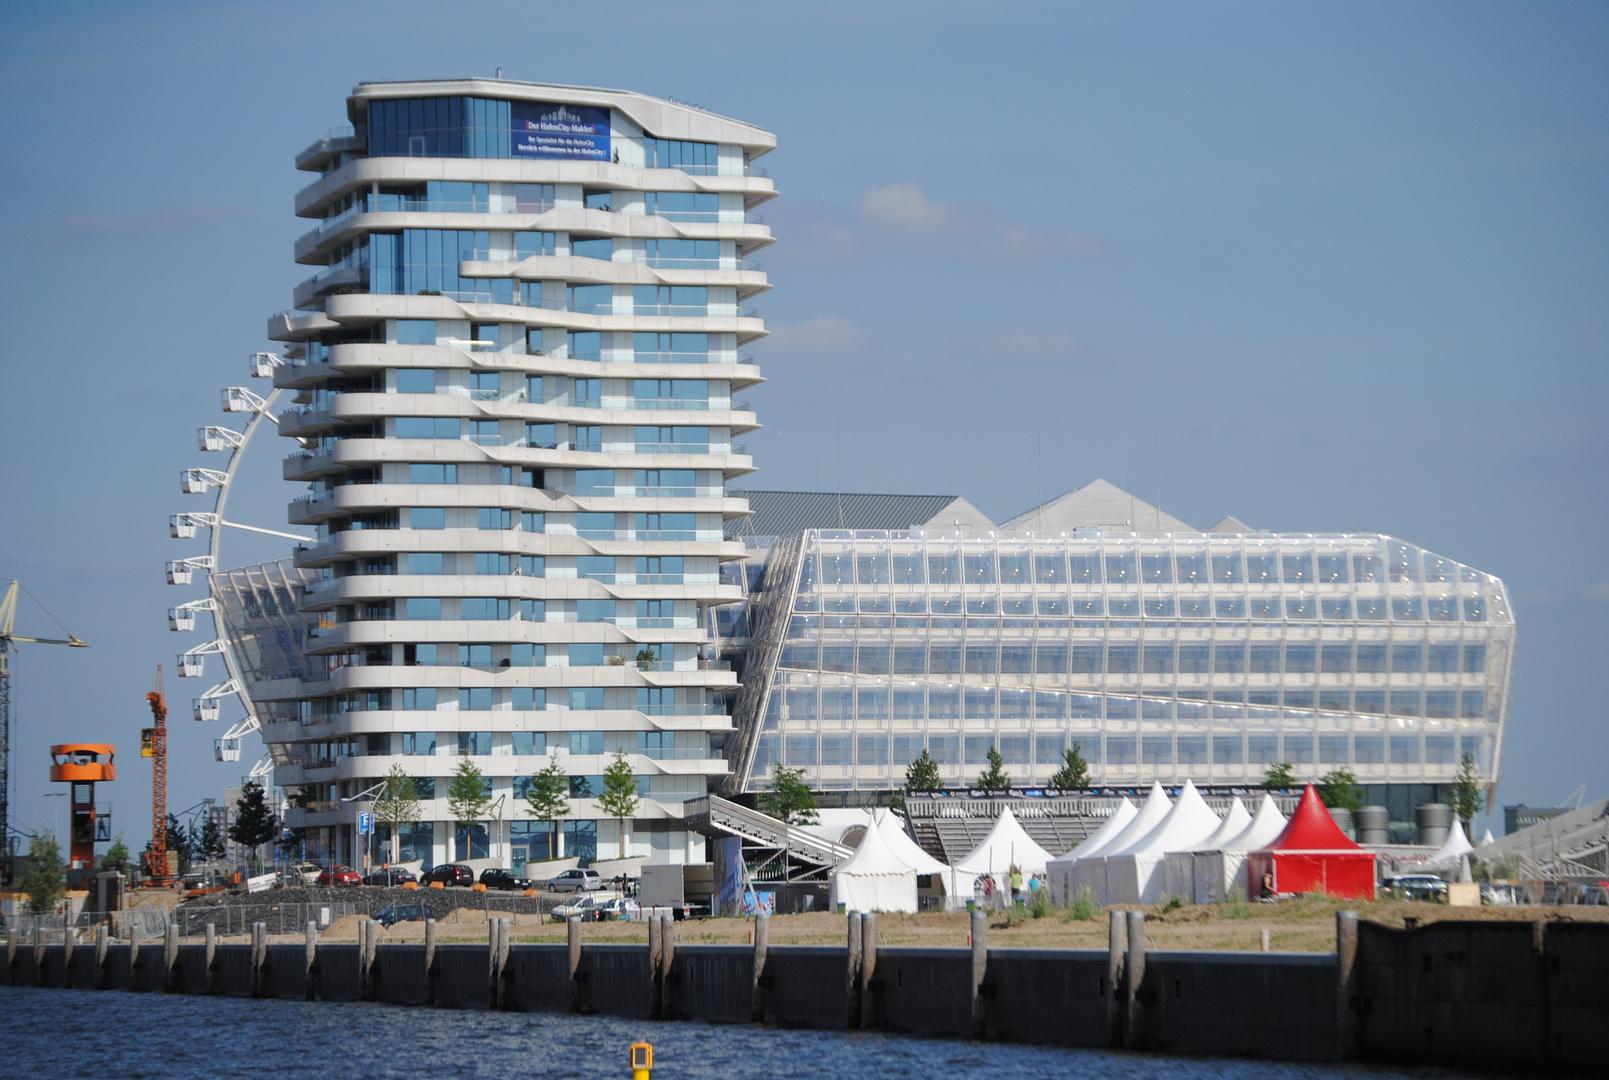 Hamburger Hafen City 1